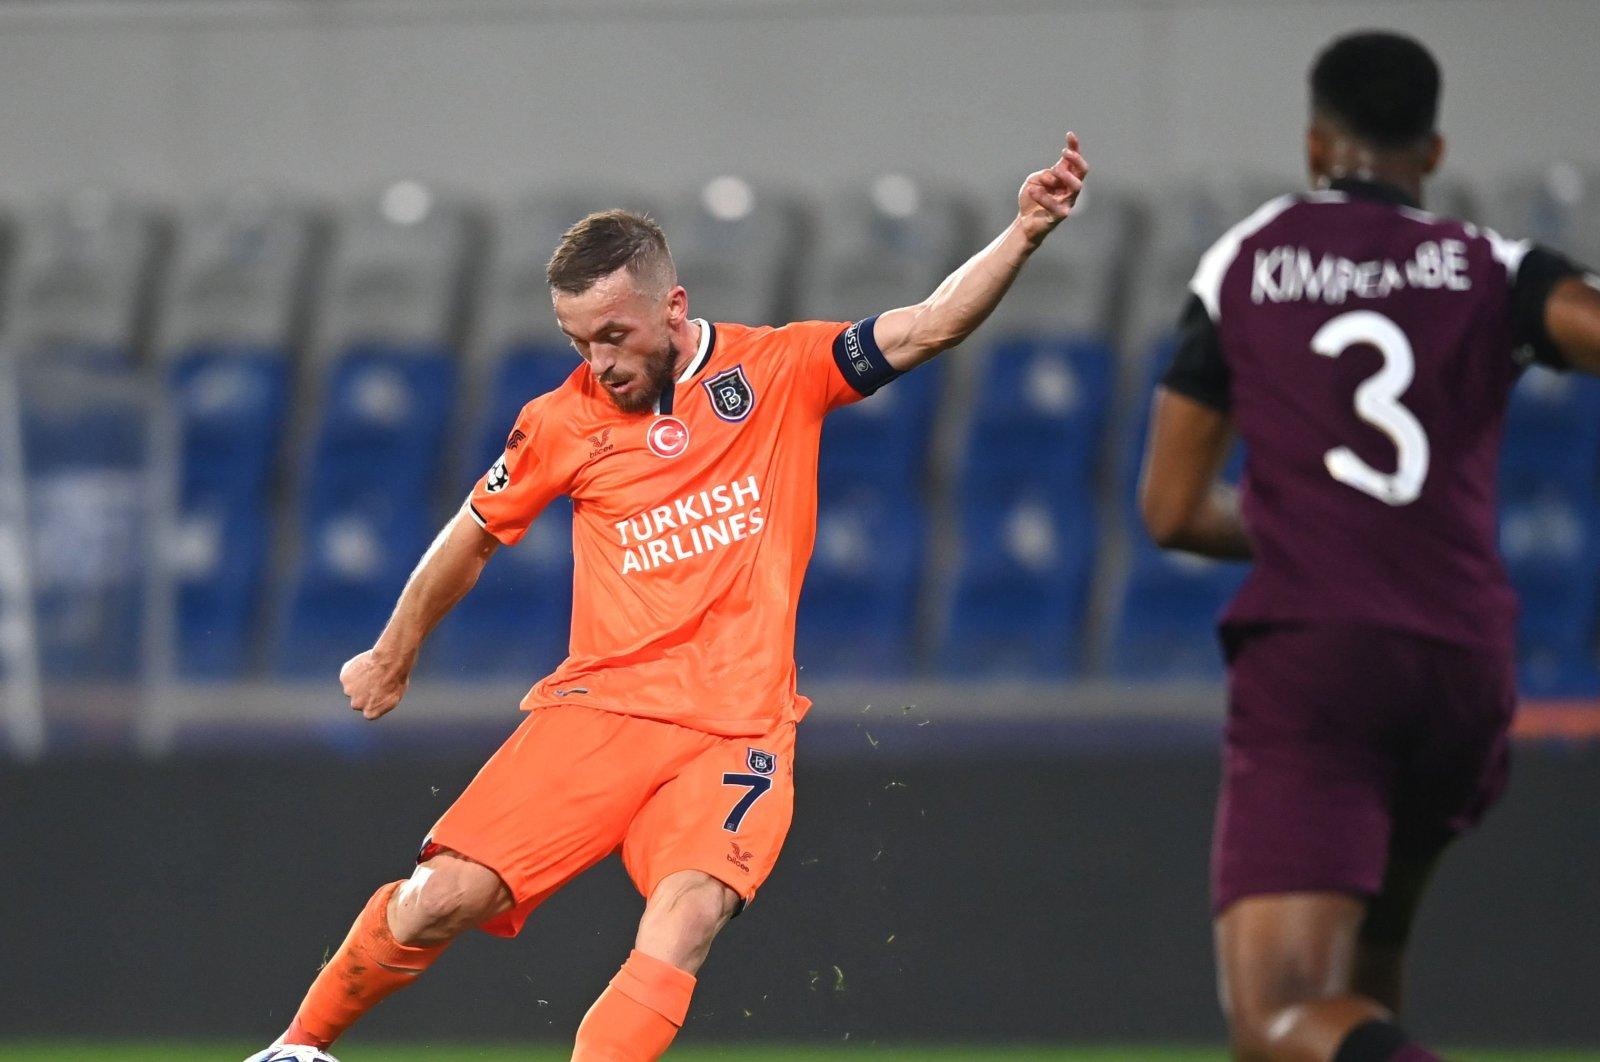 Başakşehir's Edin Visca kicks the ball during the match against Paris Saint-Germain, in Istanbul, Turkey, Oct. 28, 2020. (AFP Photo)